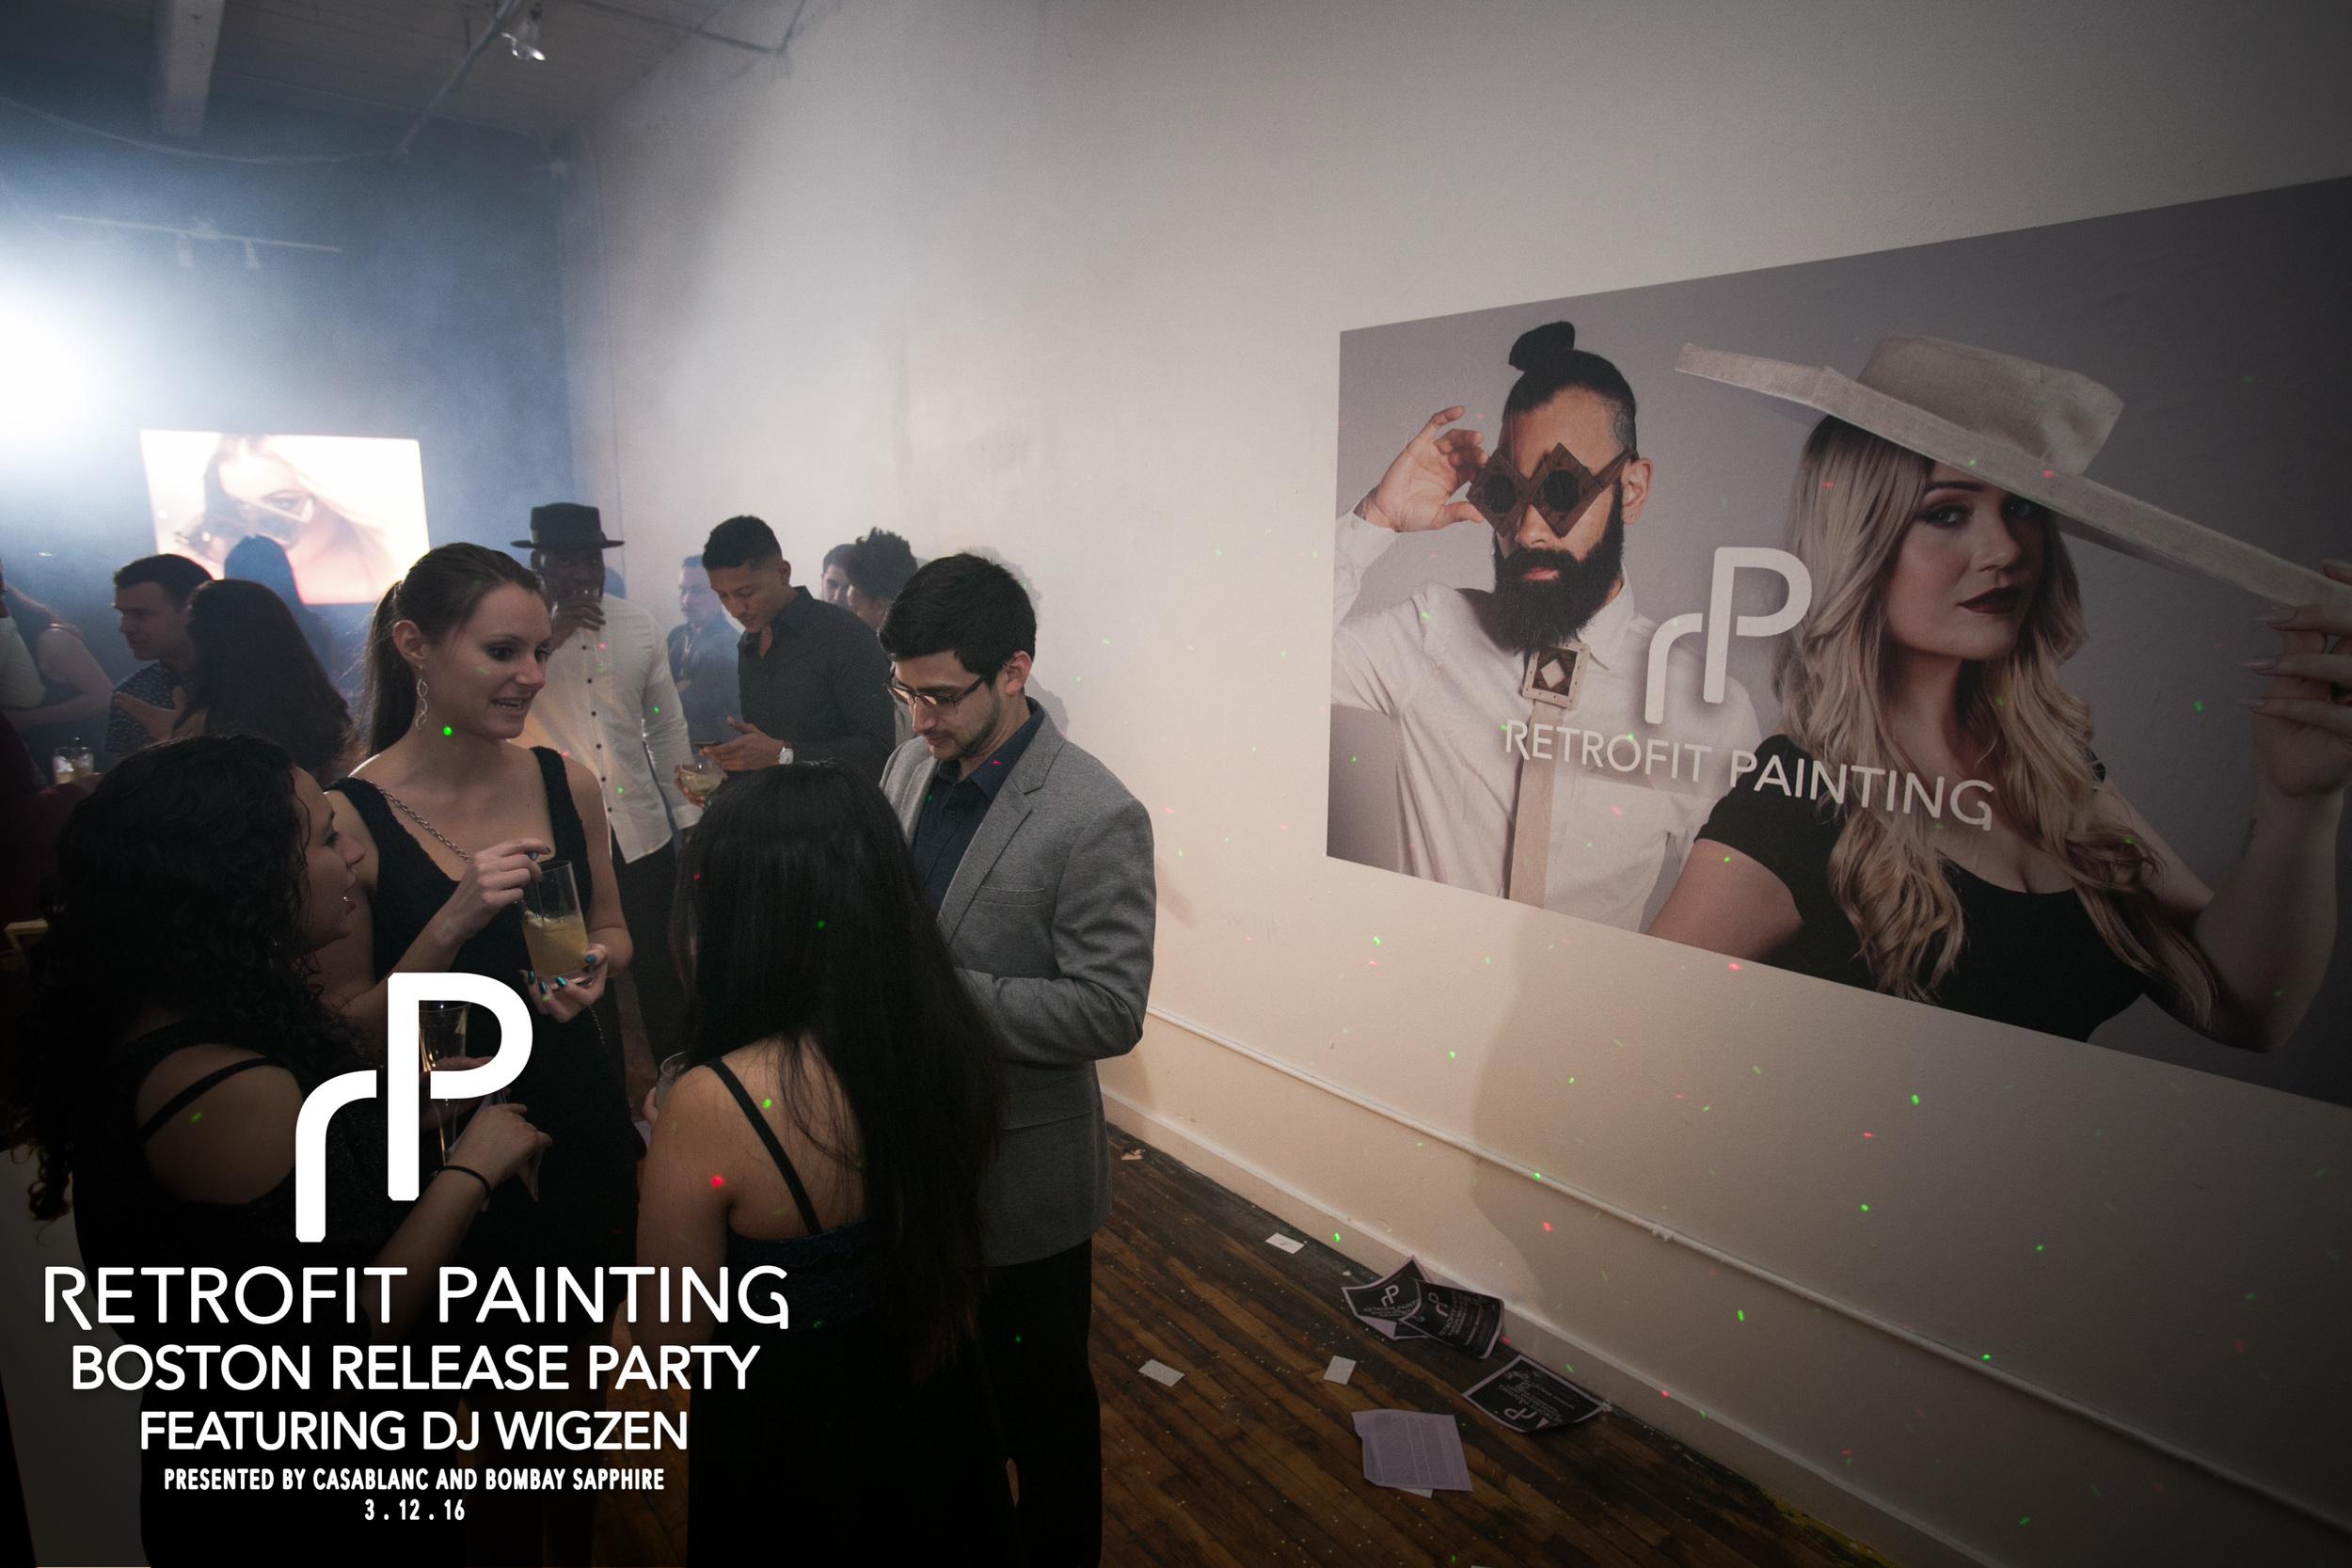 Retrofit Painting Boston Release Party 0170.jpg